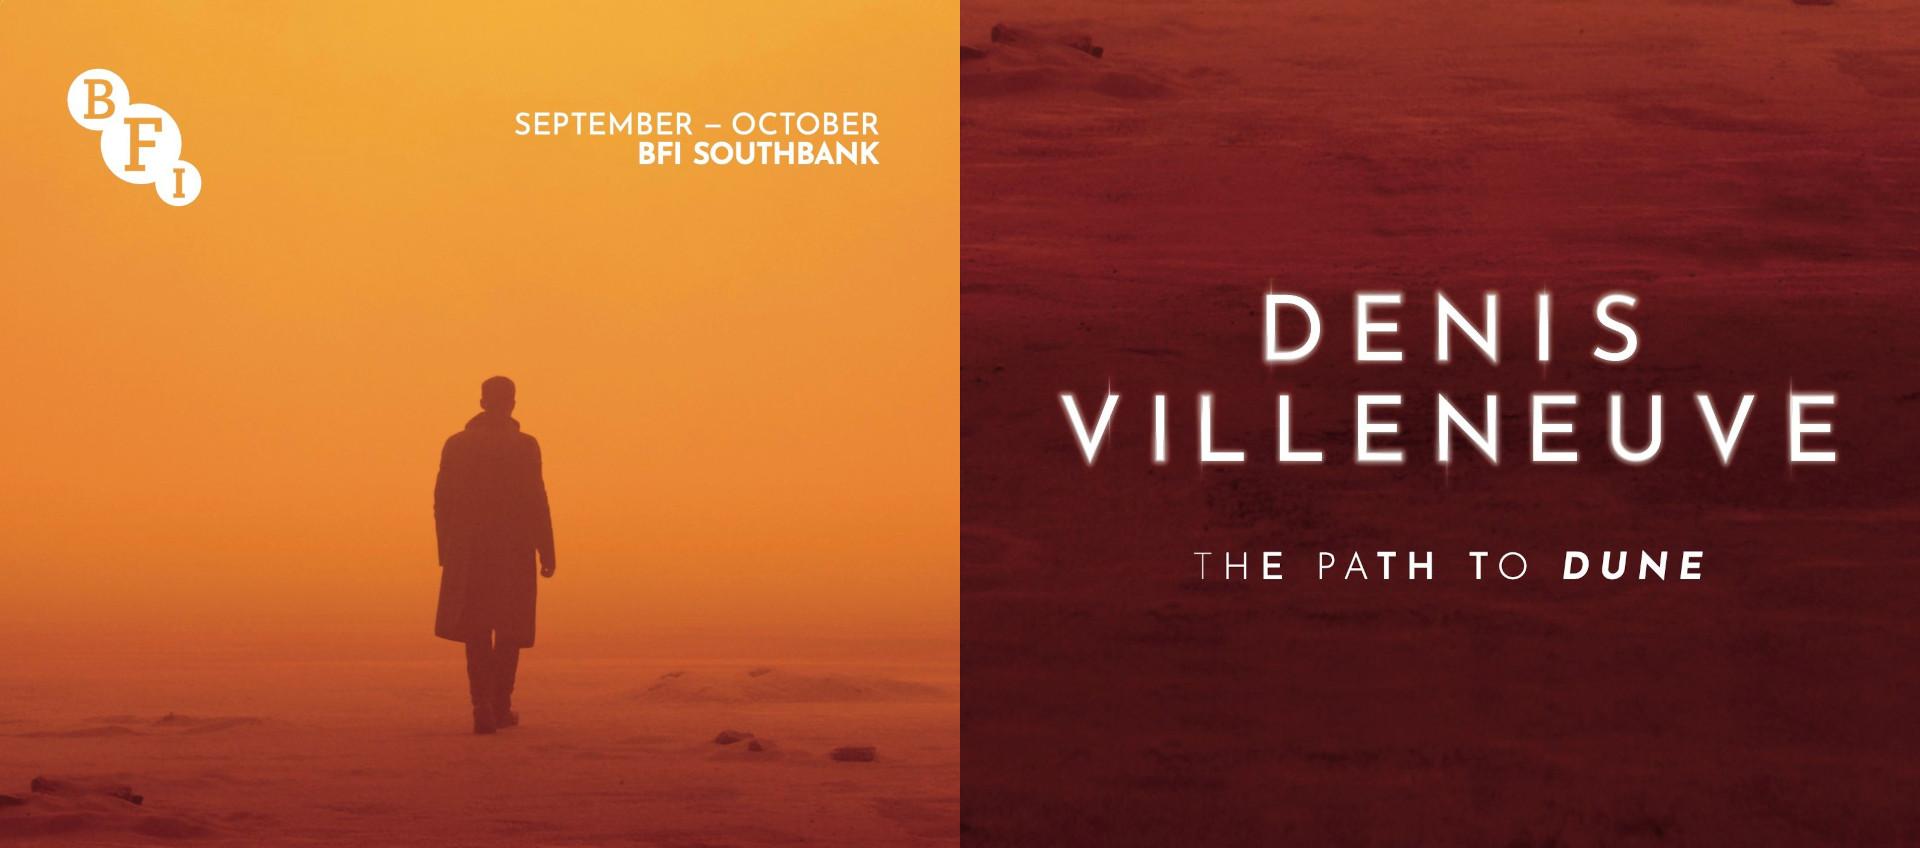 Denis Villeneuve: The Path to Dune at BFI Southbank